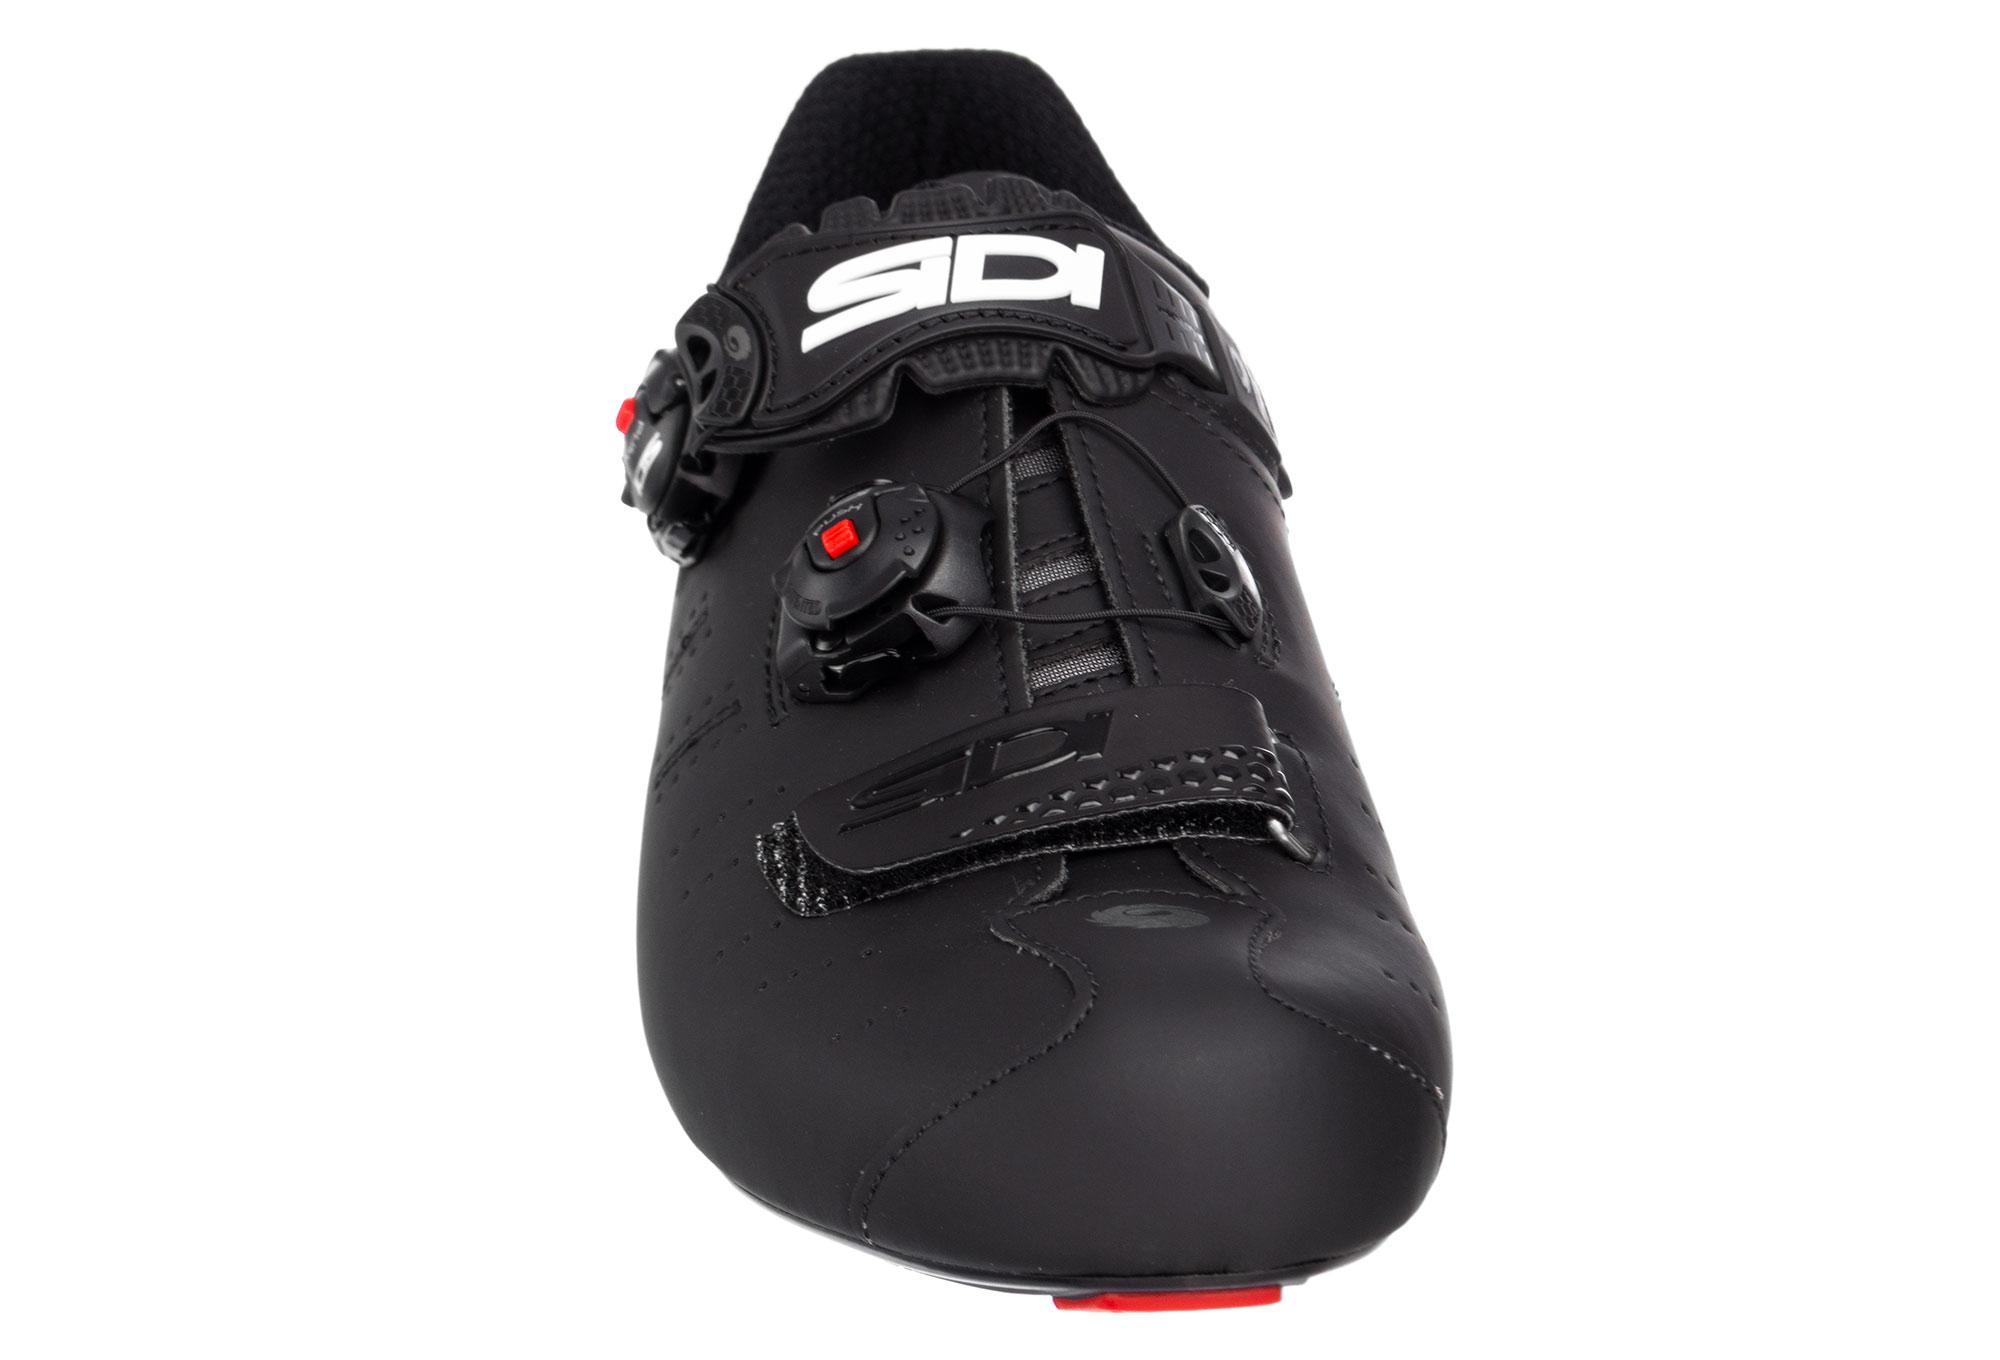 Sidi Ergo 5 Mega Matt Black Road Shoes